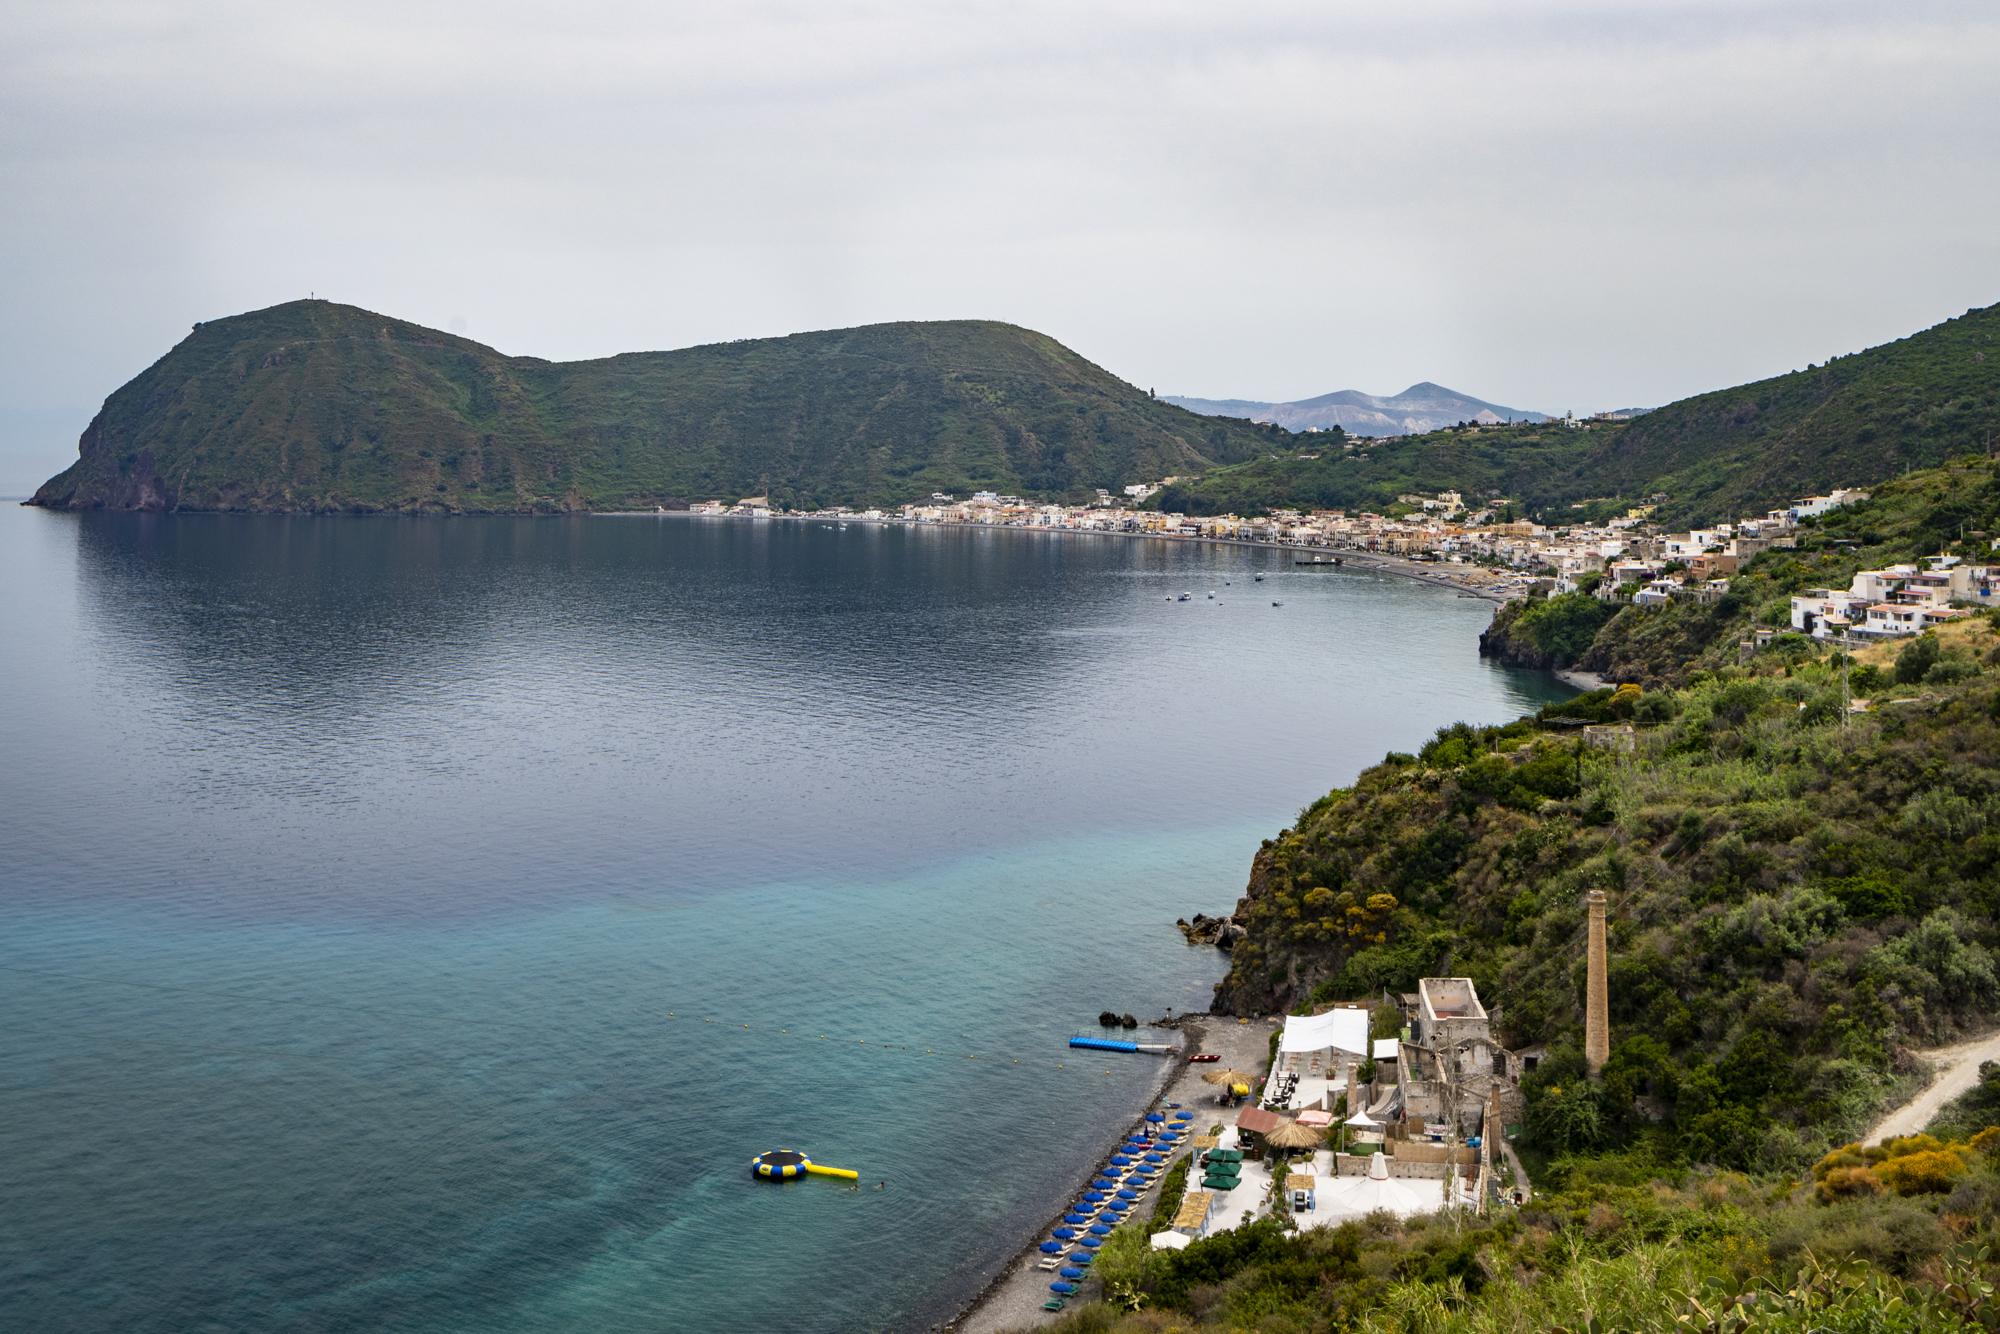 Panorama - Whites Beach & Canneto, Lipari